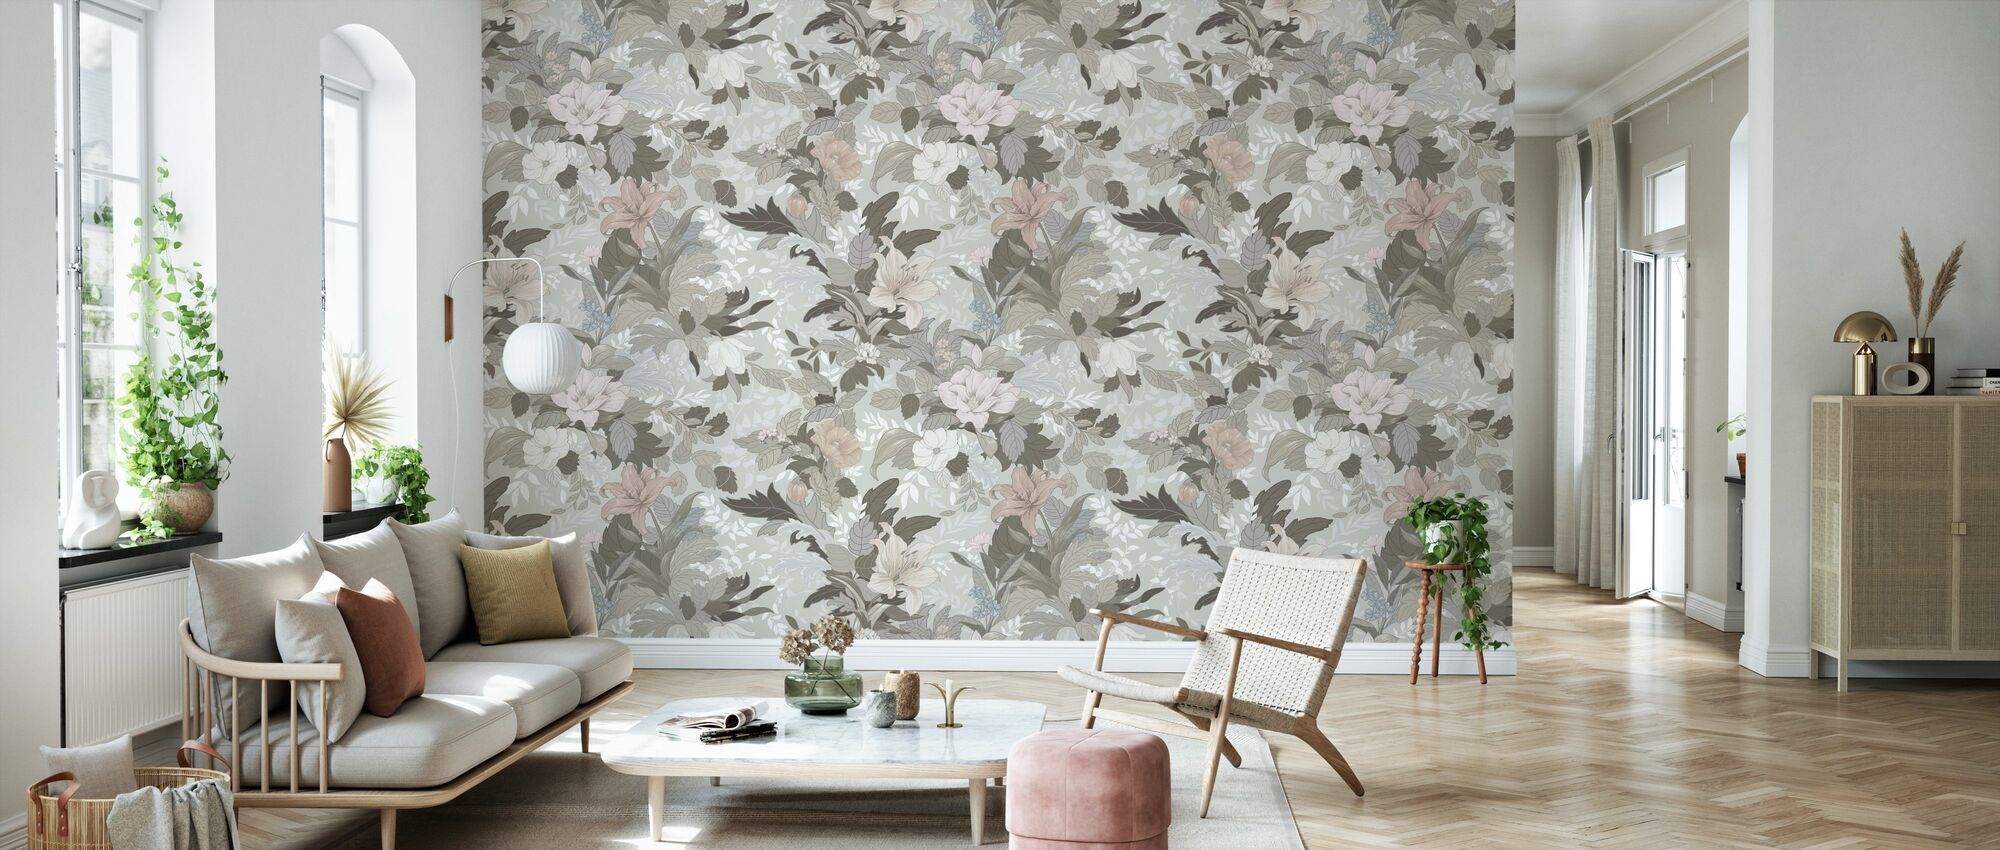 Allure - Forgotten Memories - Wallpaper - Living Room